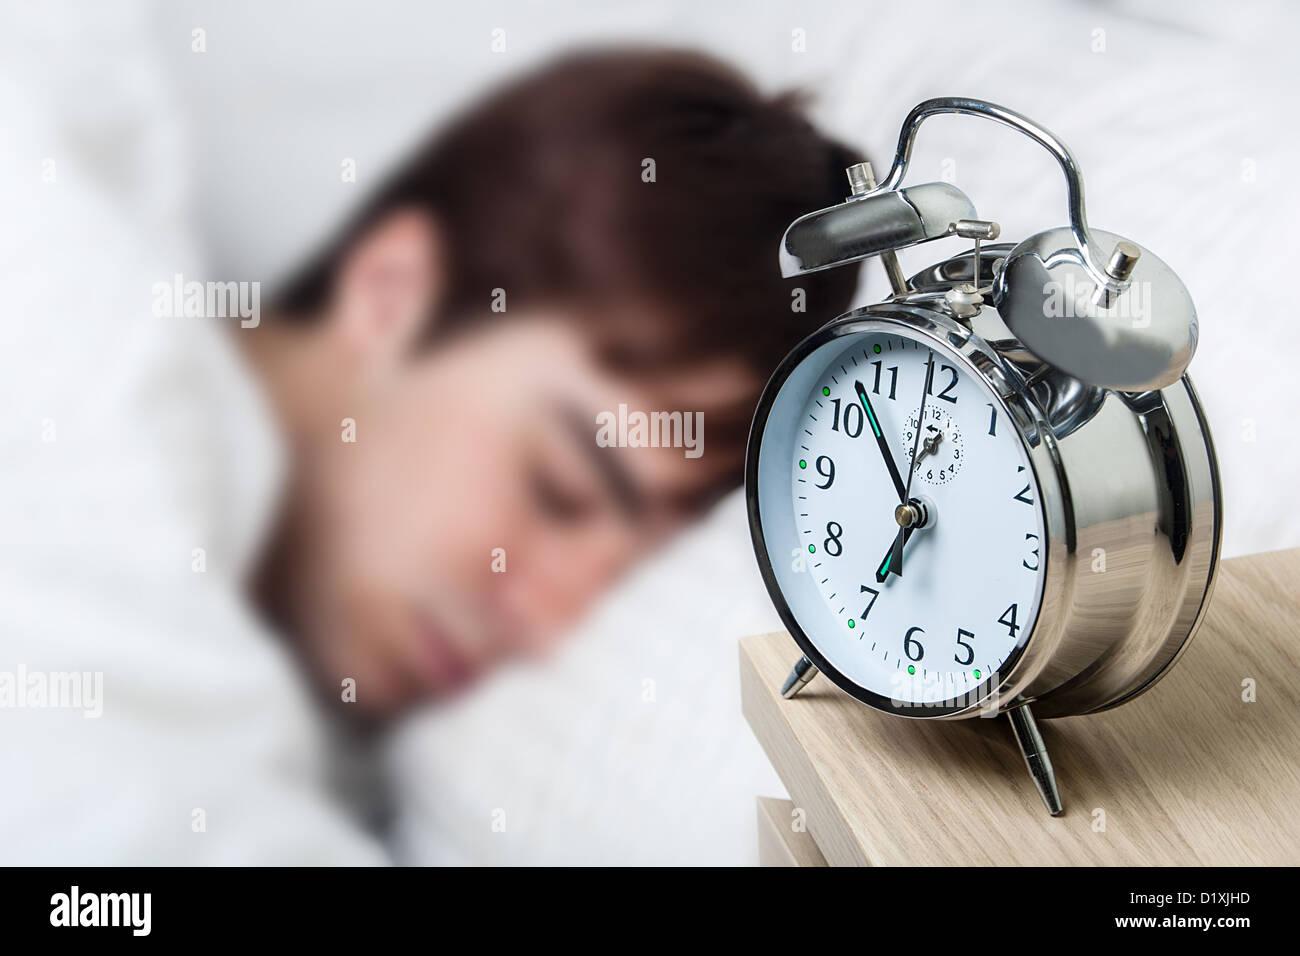 alarm clock 6 stockfotos alarm clock 6 bilder alamy. Black Bedroom Furniture Sets. Home Design Ideas